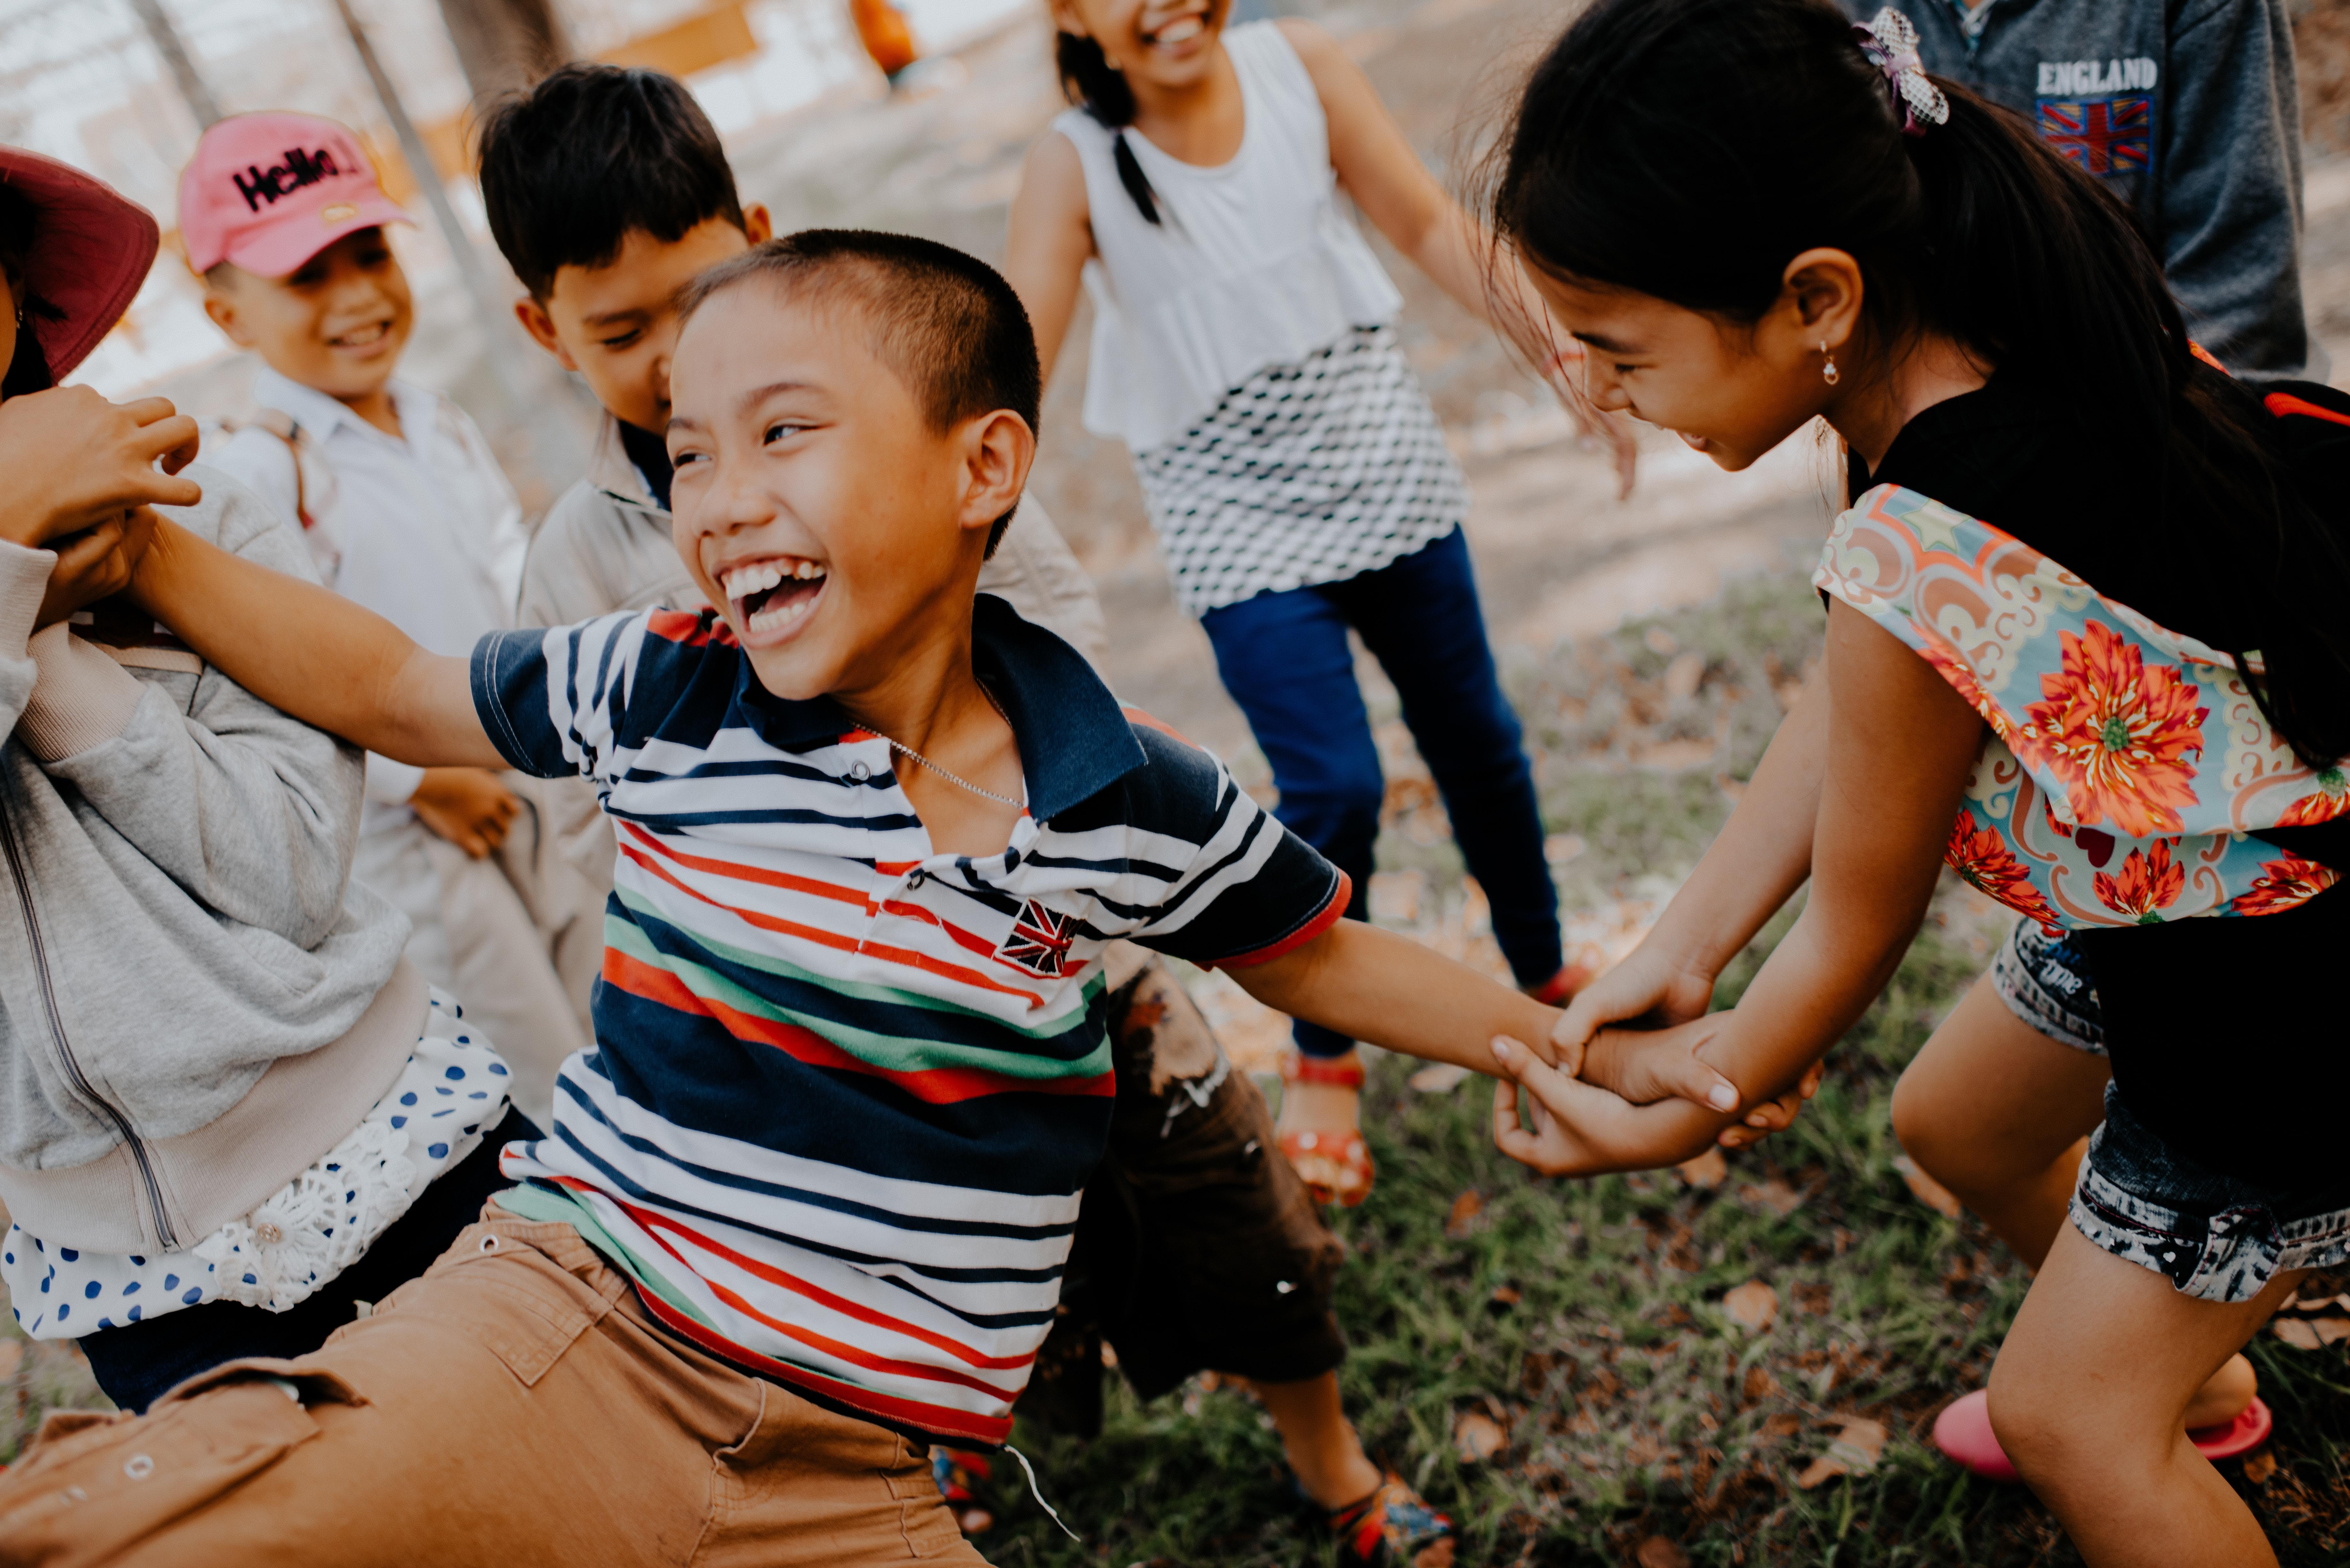 children playing on grass field